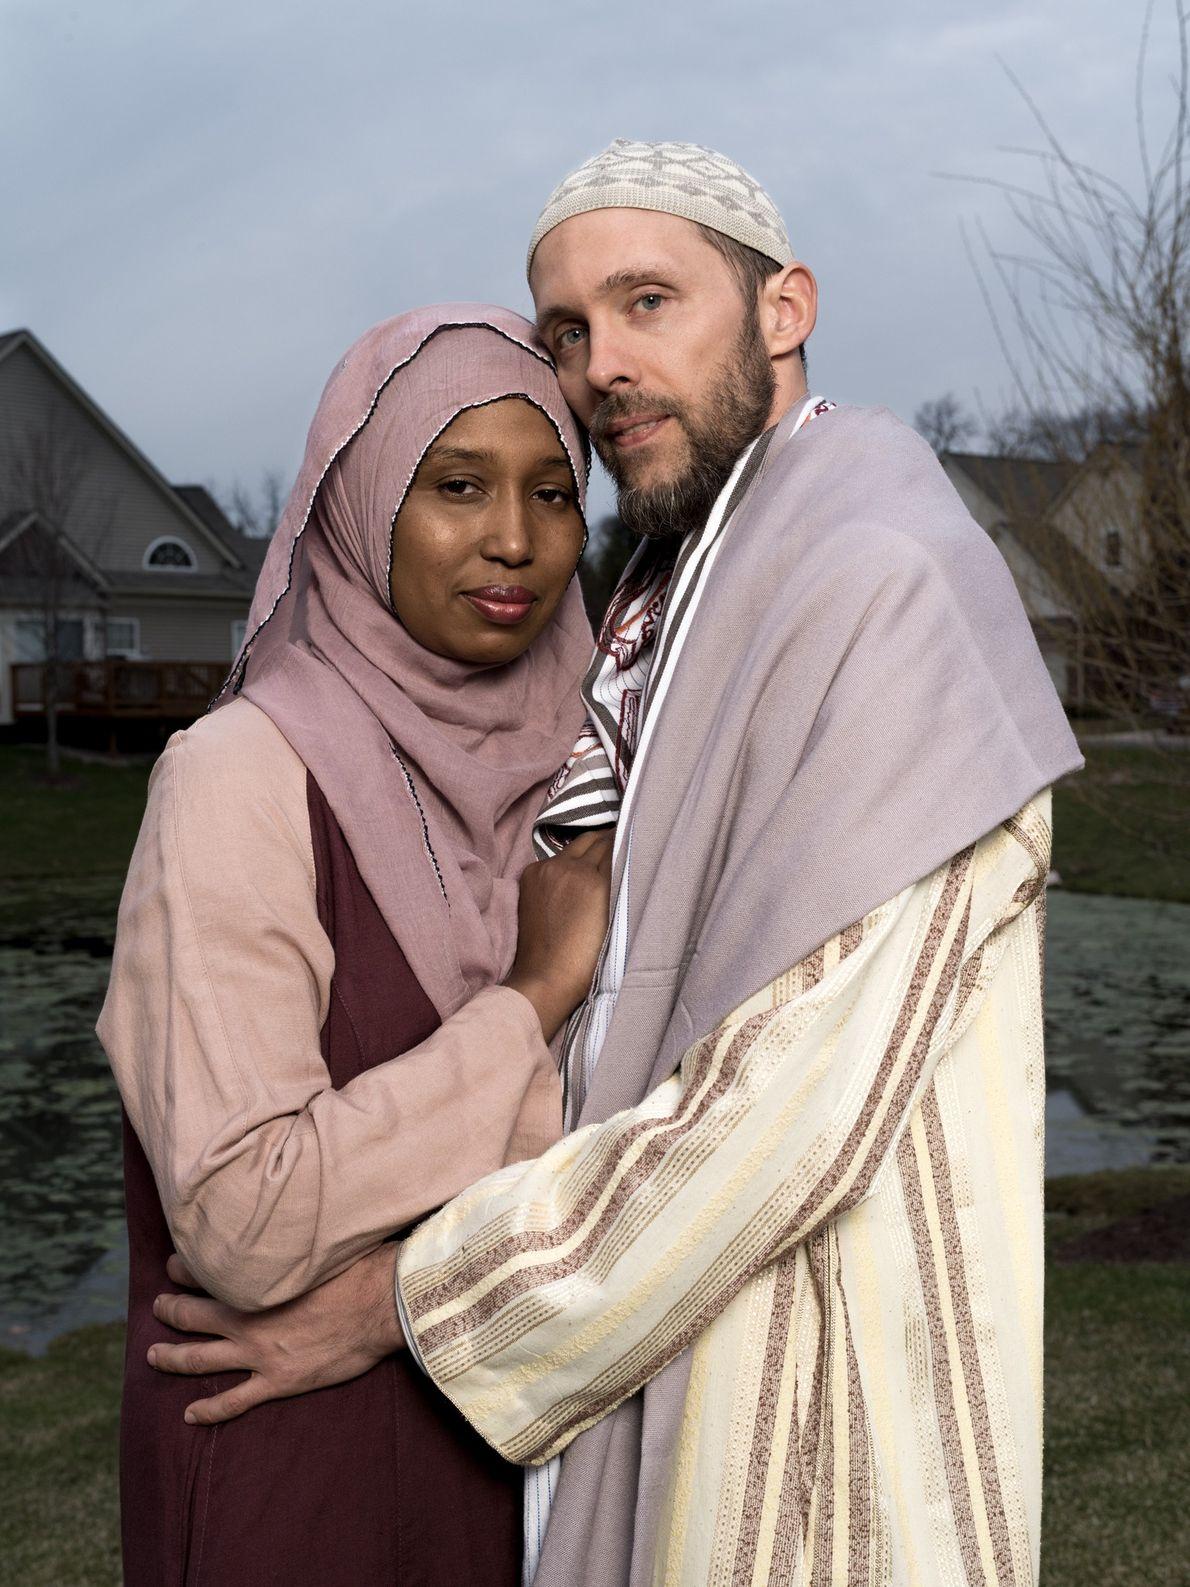 Kamilah Munirah Bolling y Adil Justin Cole